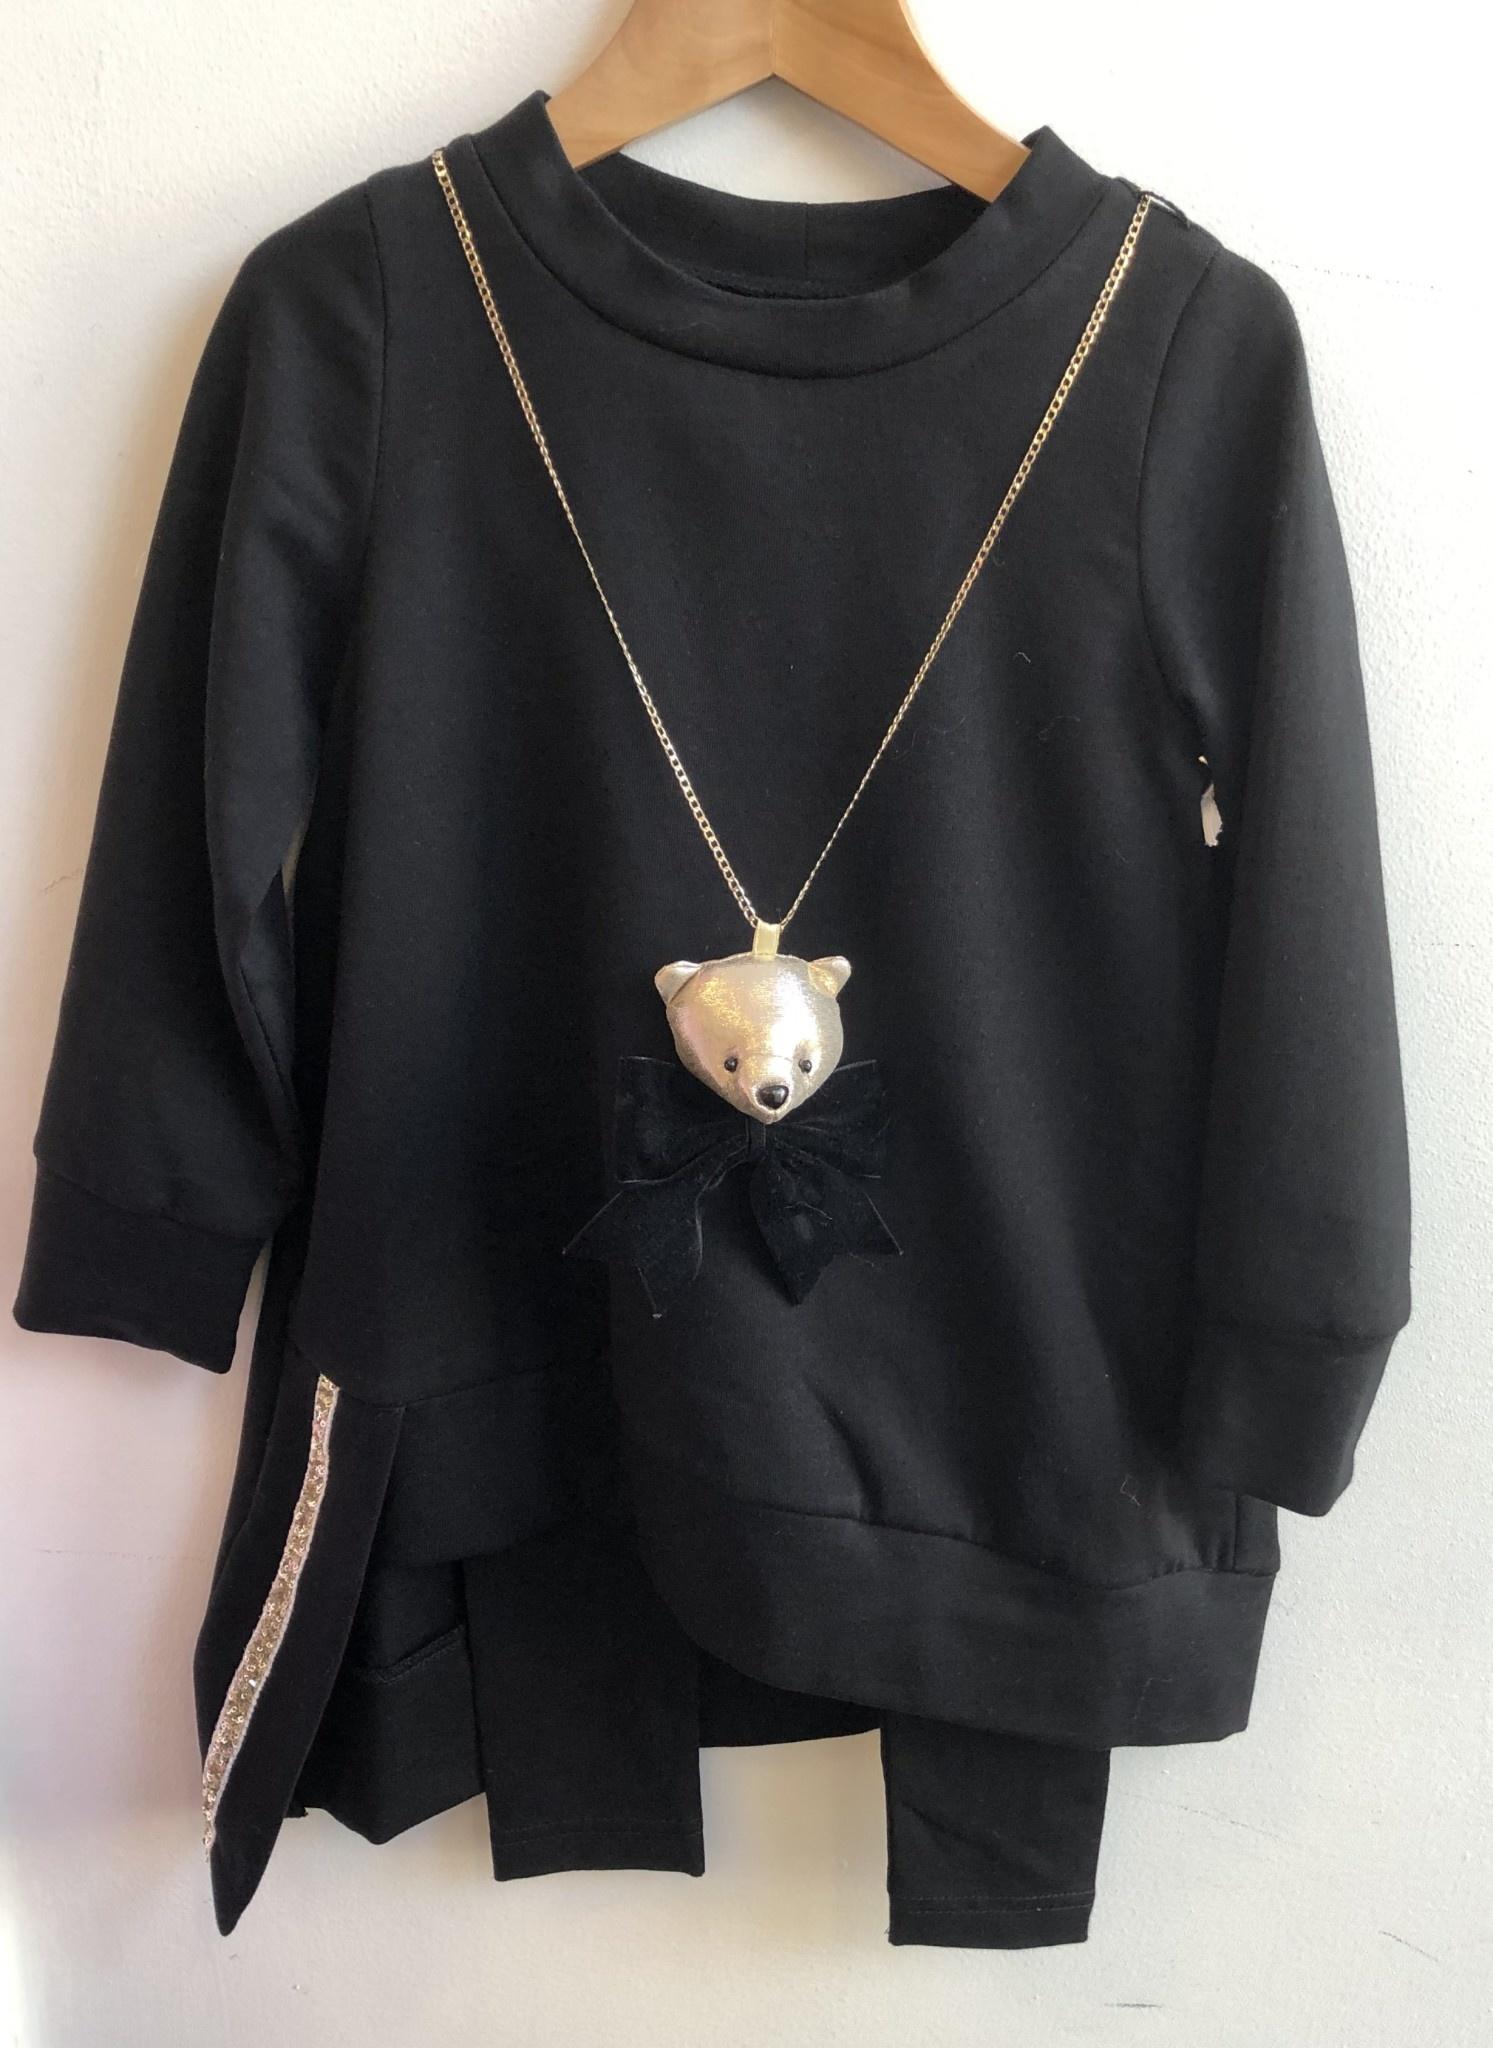 Daga Daga Black Legging Set With Bear Necklace